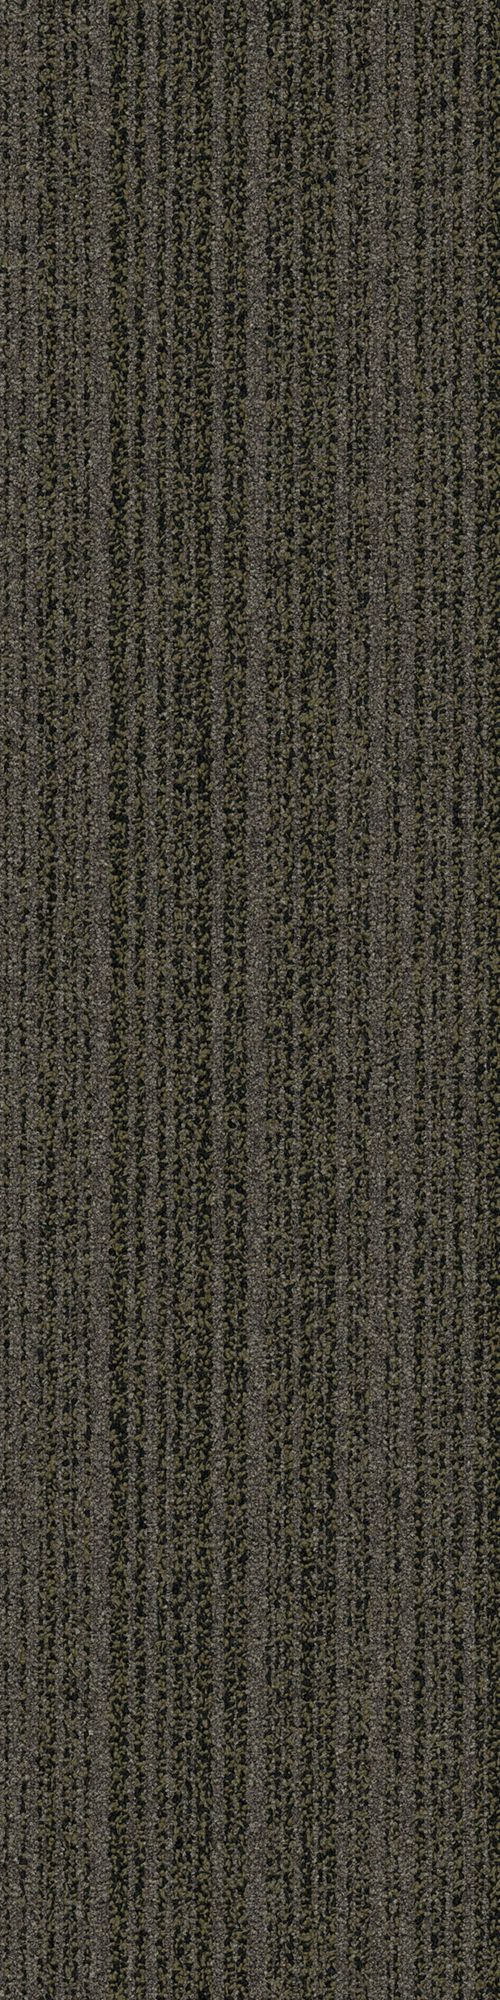 Interface carpet tile bp410 color name oregano variant 4 bike interface carpet tile bp410 color name oregano variant 4 baanklon Gallery